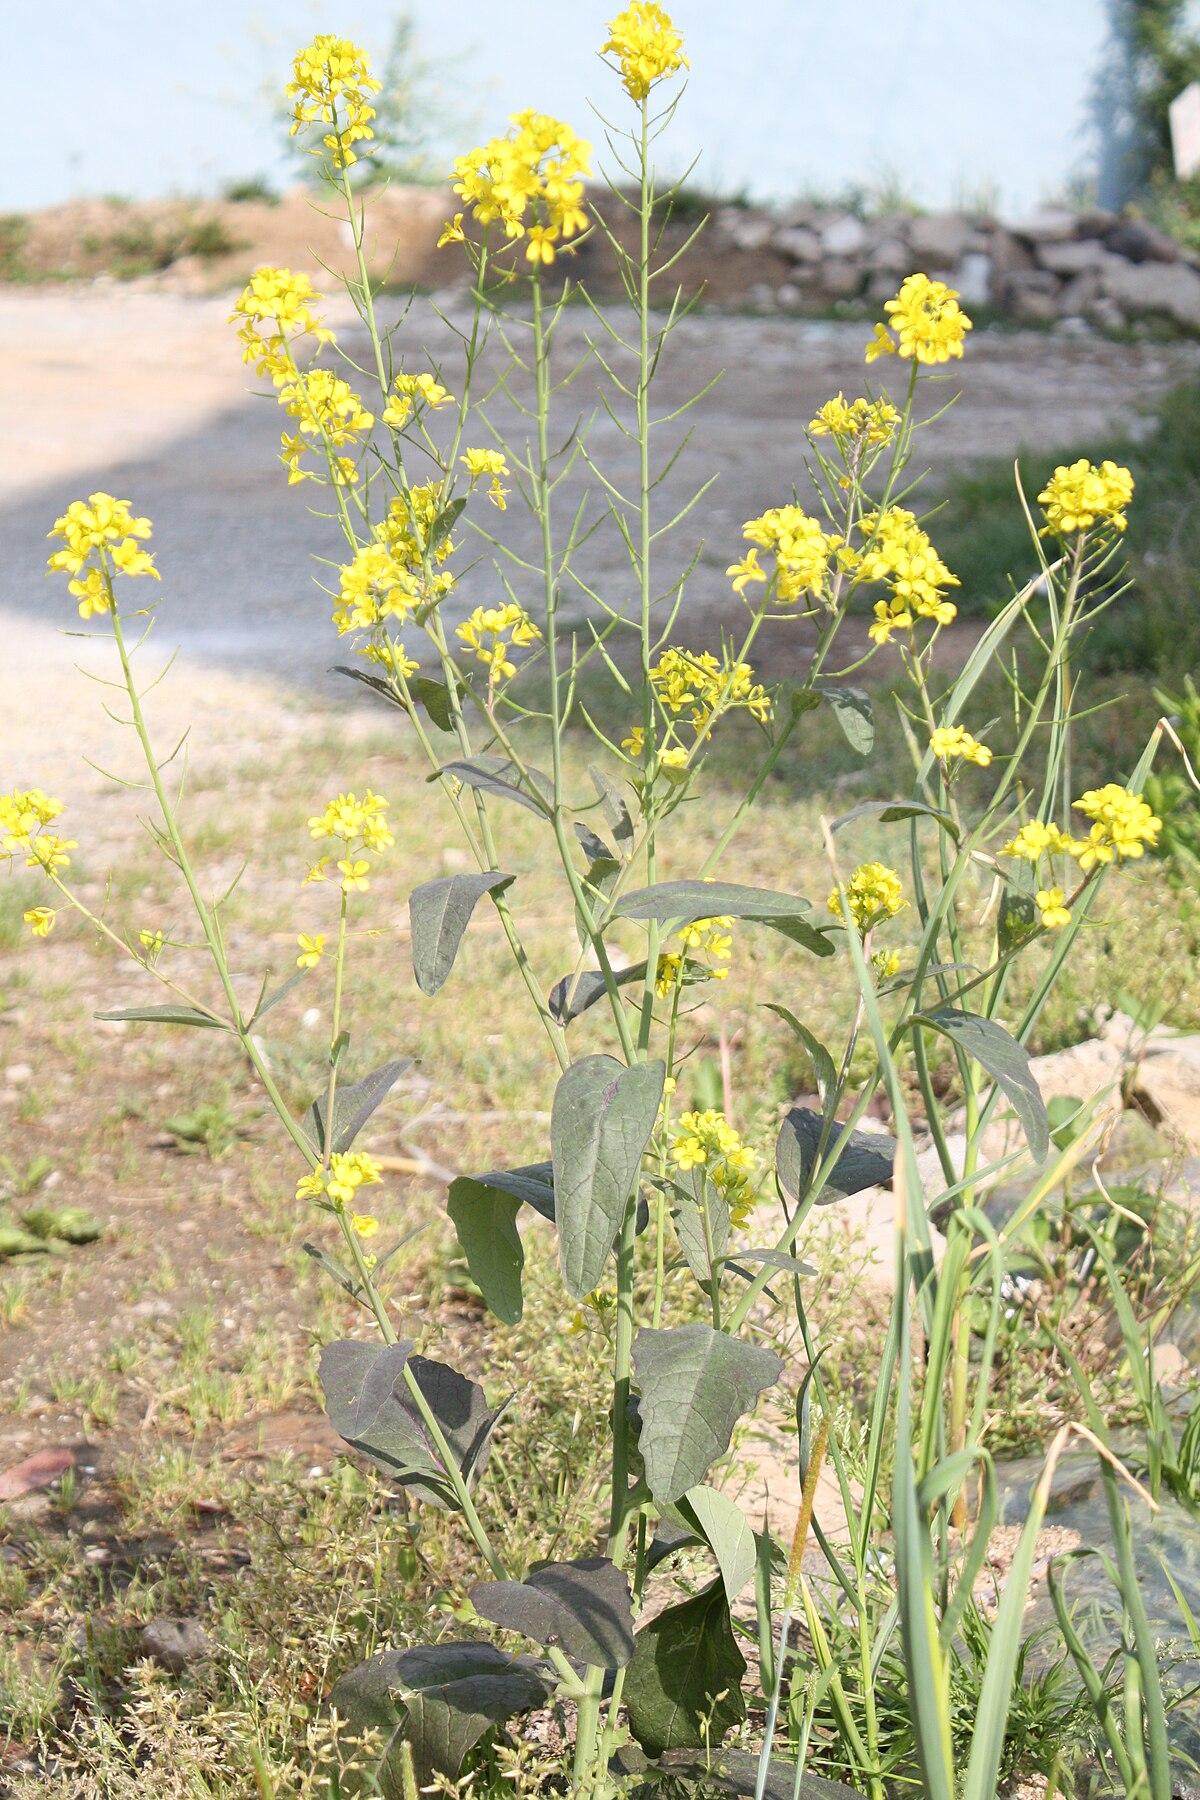 mustard - Wiktionary